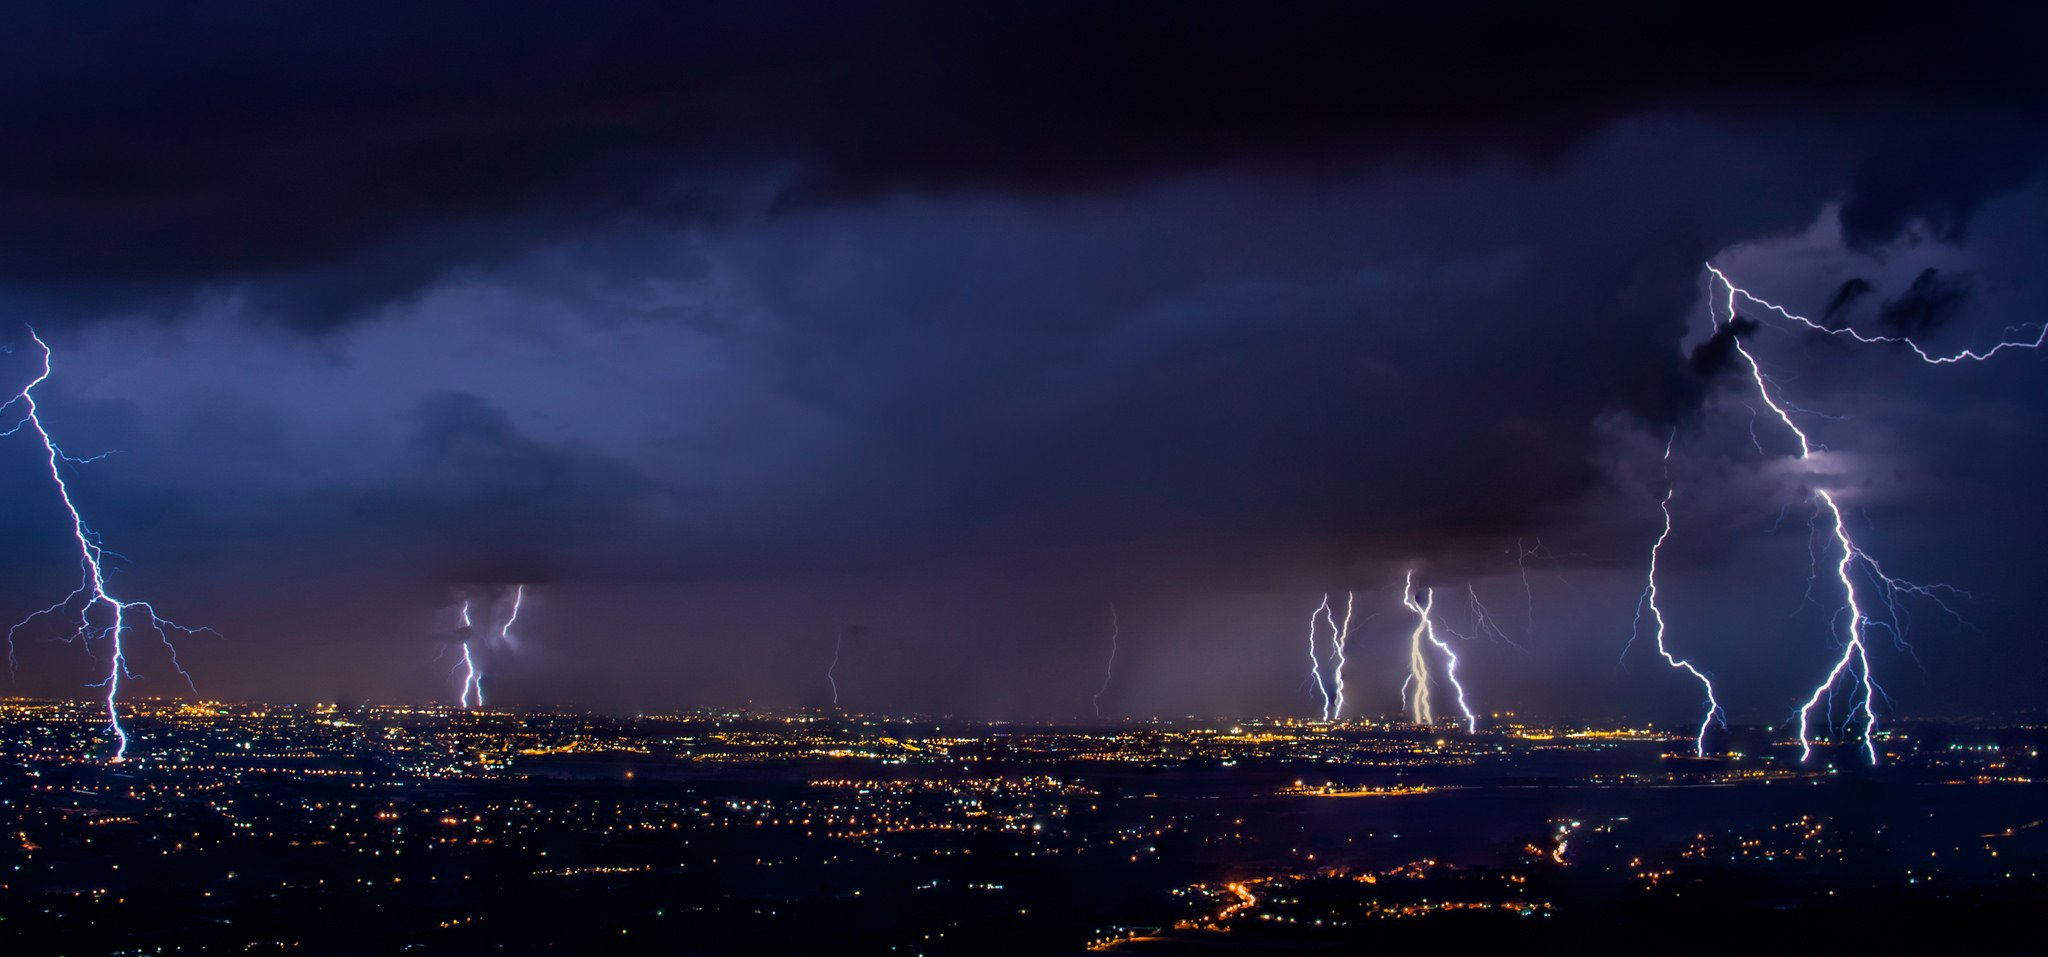 villam-vihar-tulfeszultsegvedelem-dunacomp-informatika-dunaujvaros